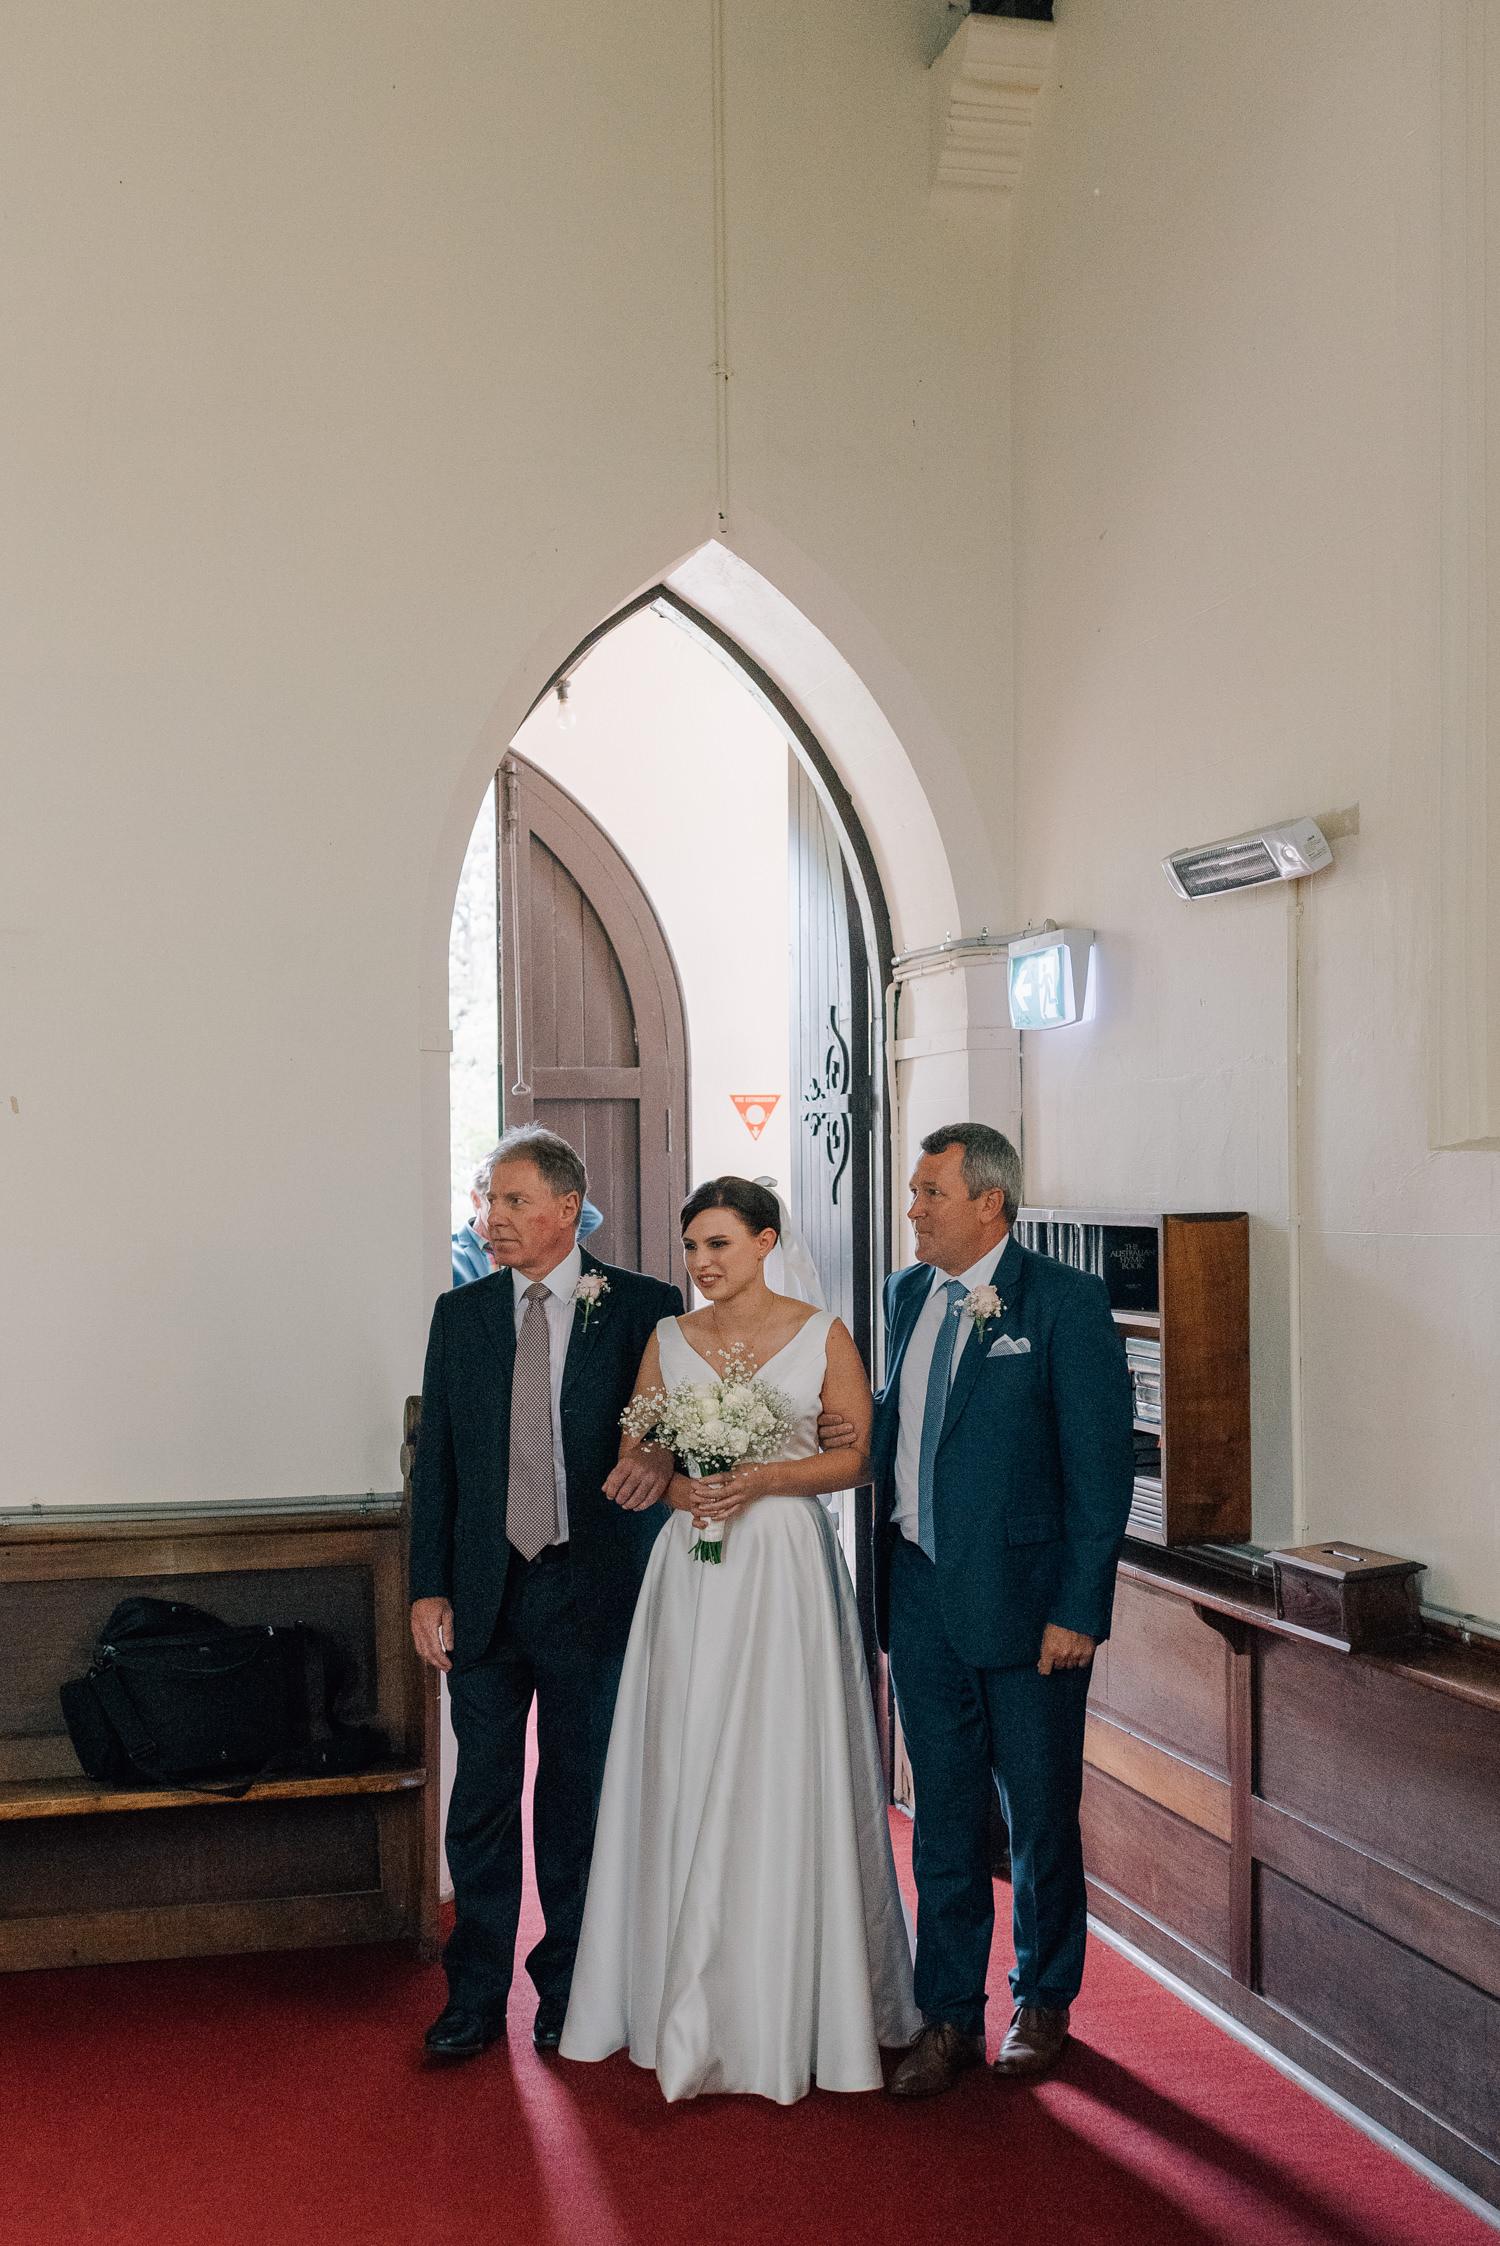 Josef-Chromy-Wedding-Photographer-18.jpg